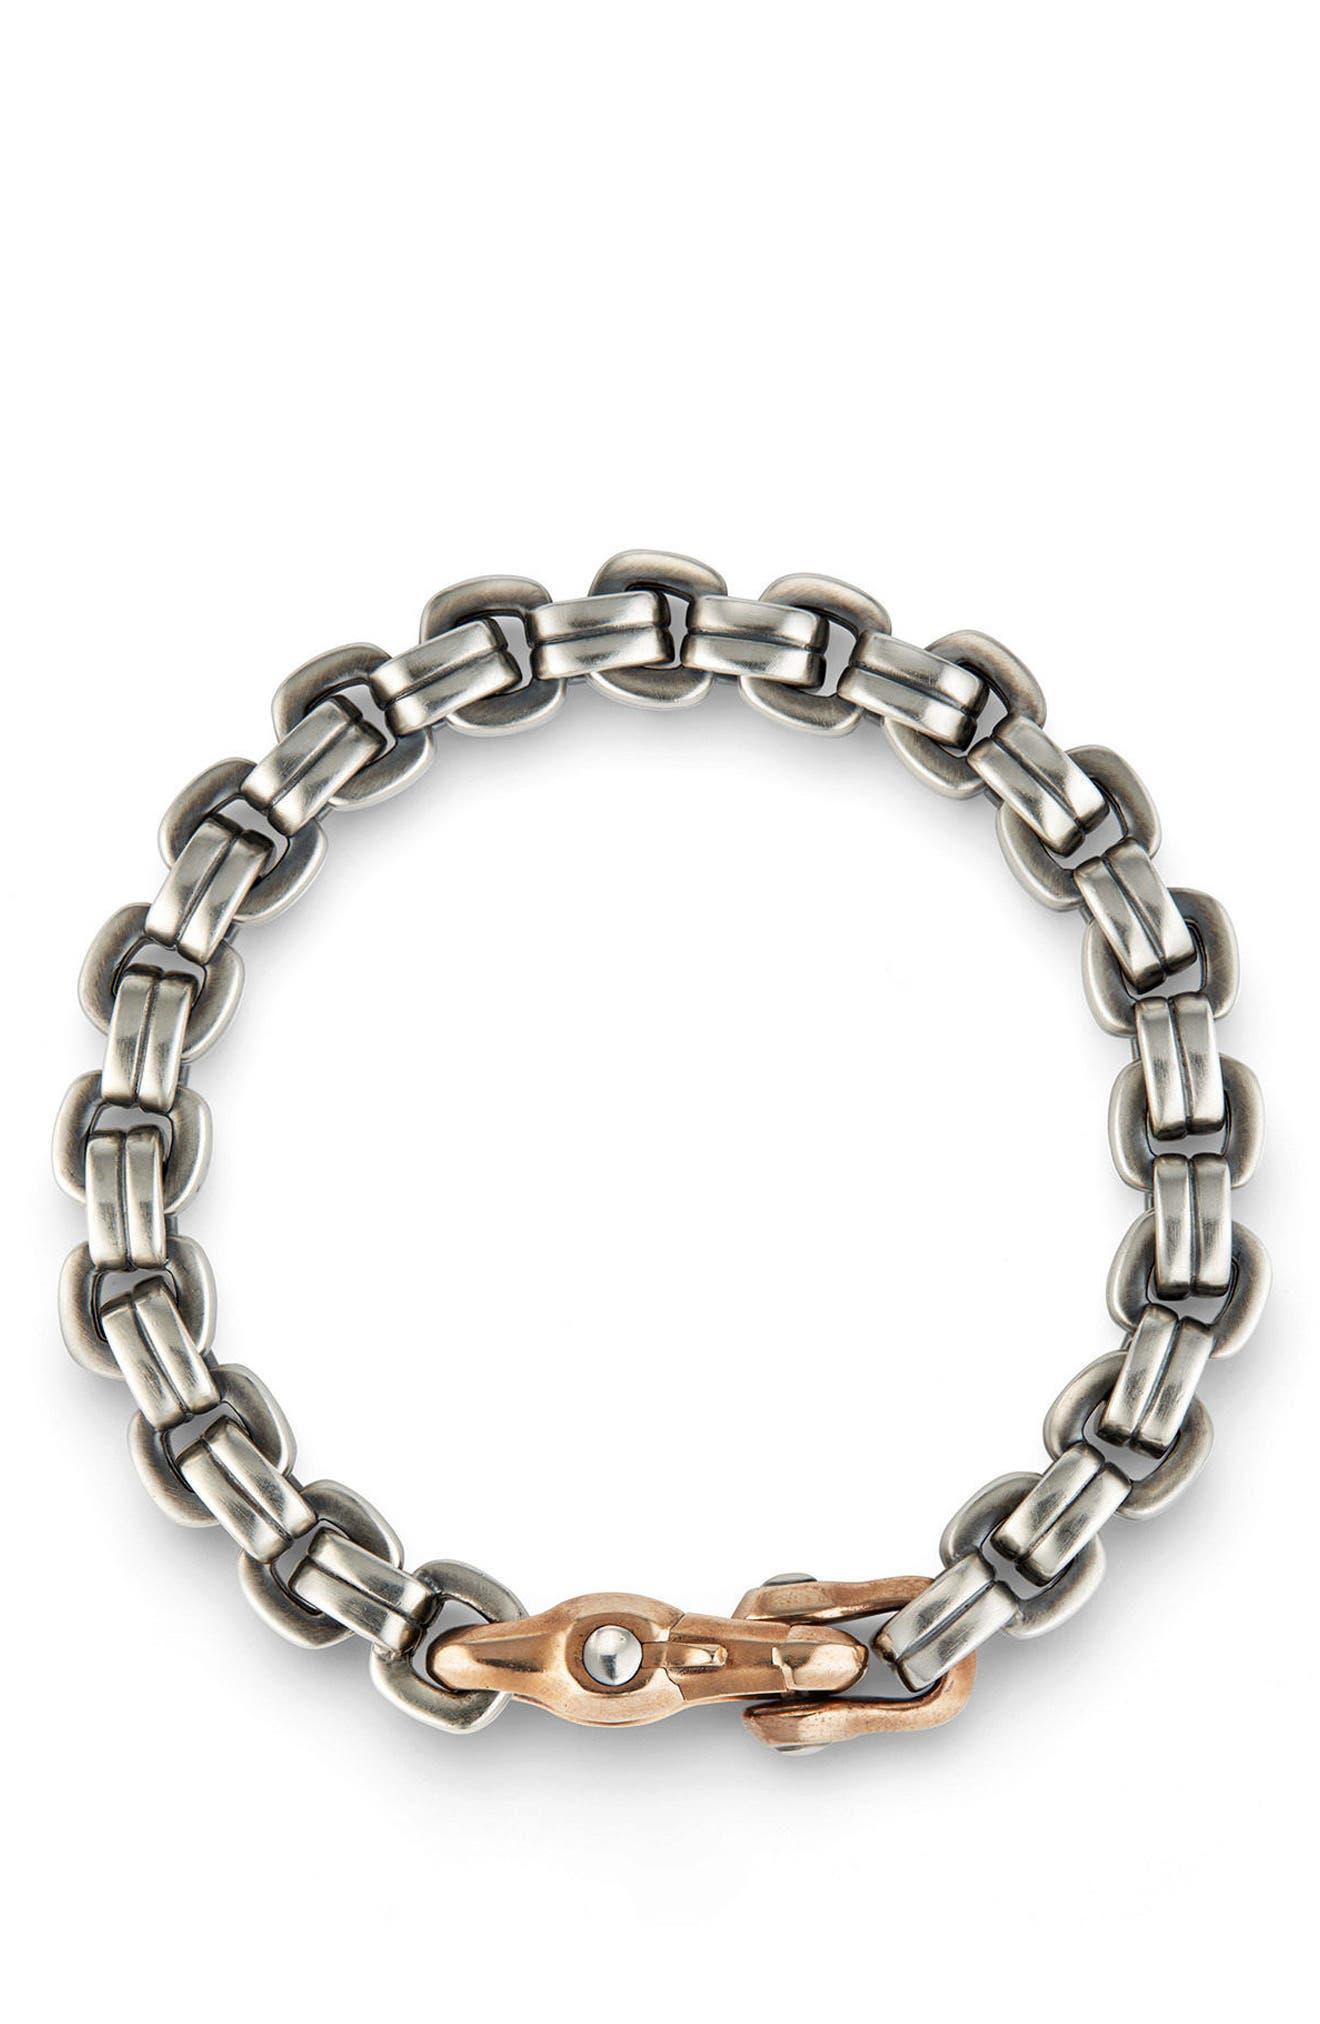 Anvil Chain Bracelet,                             Alternate thumbnail 3, color,                             SILVER/ BRONZE